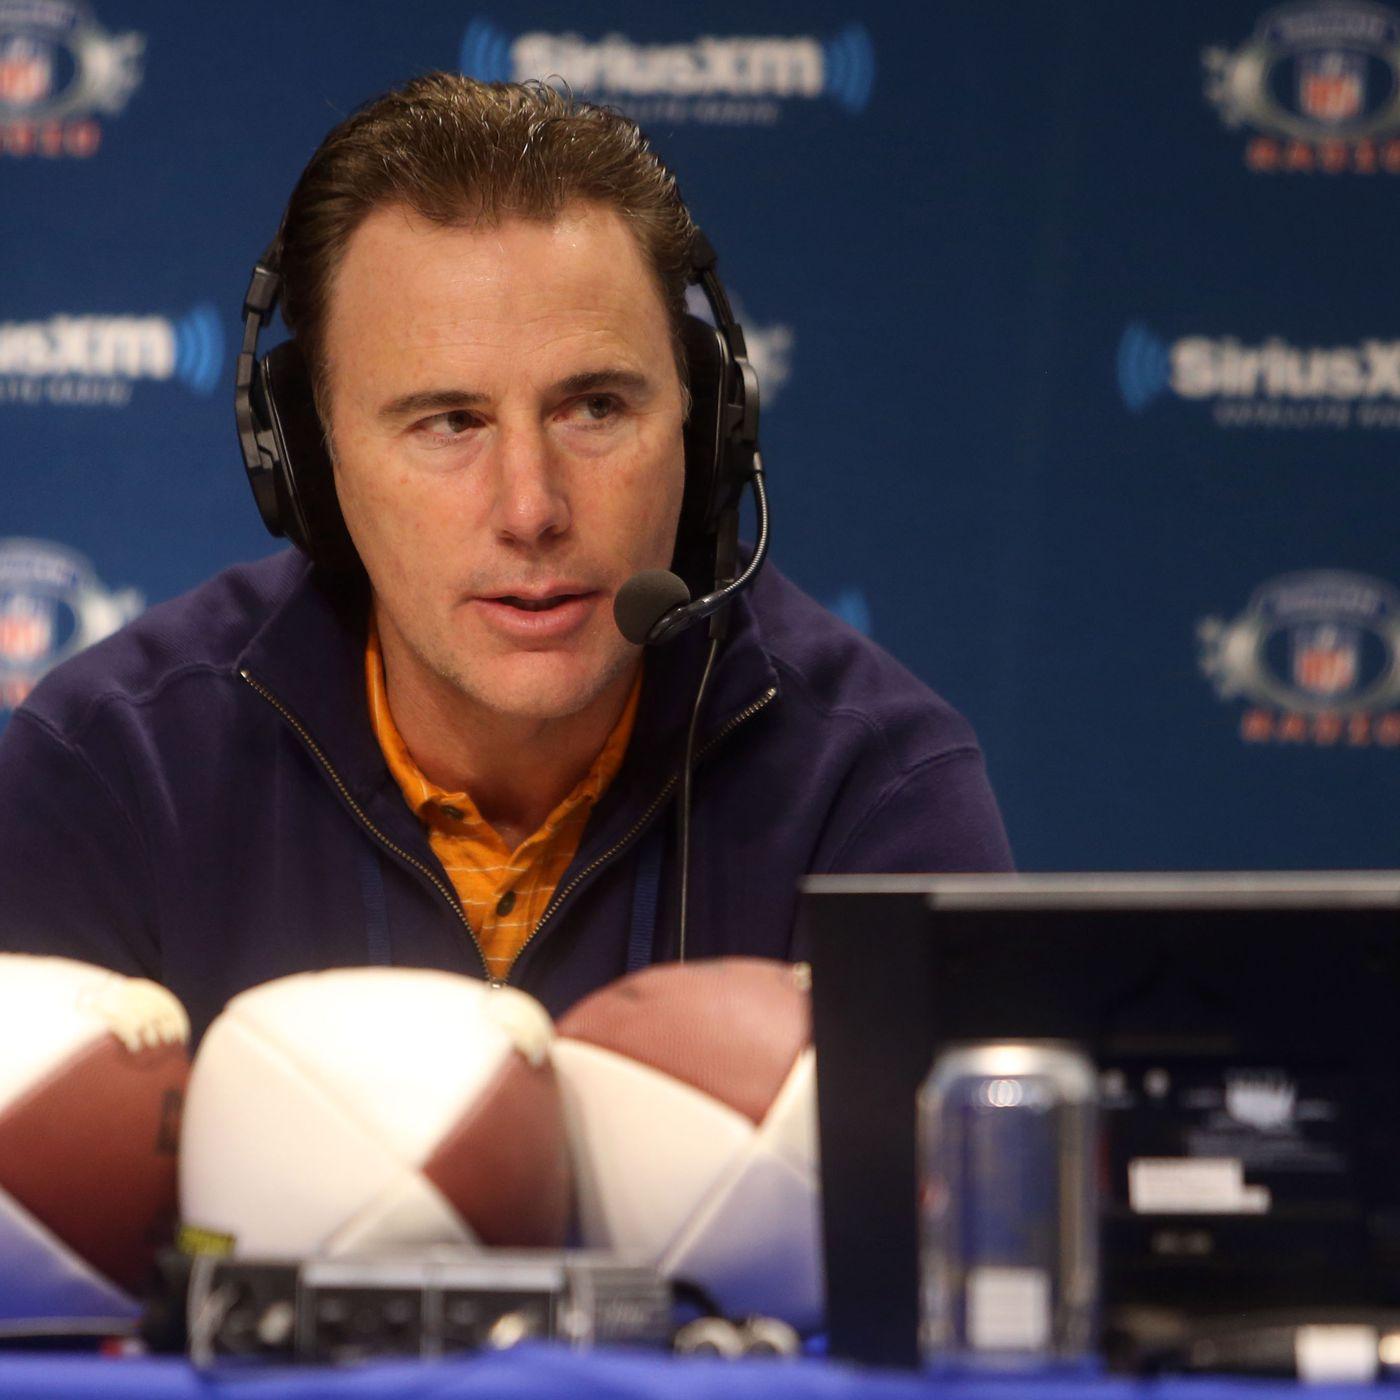 Nfl On Sirius >> Raiders Great Rich Gannon Says He S Leaving Sirius Xm Nfl Radio